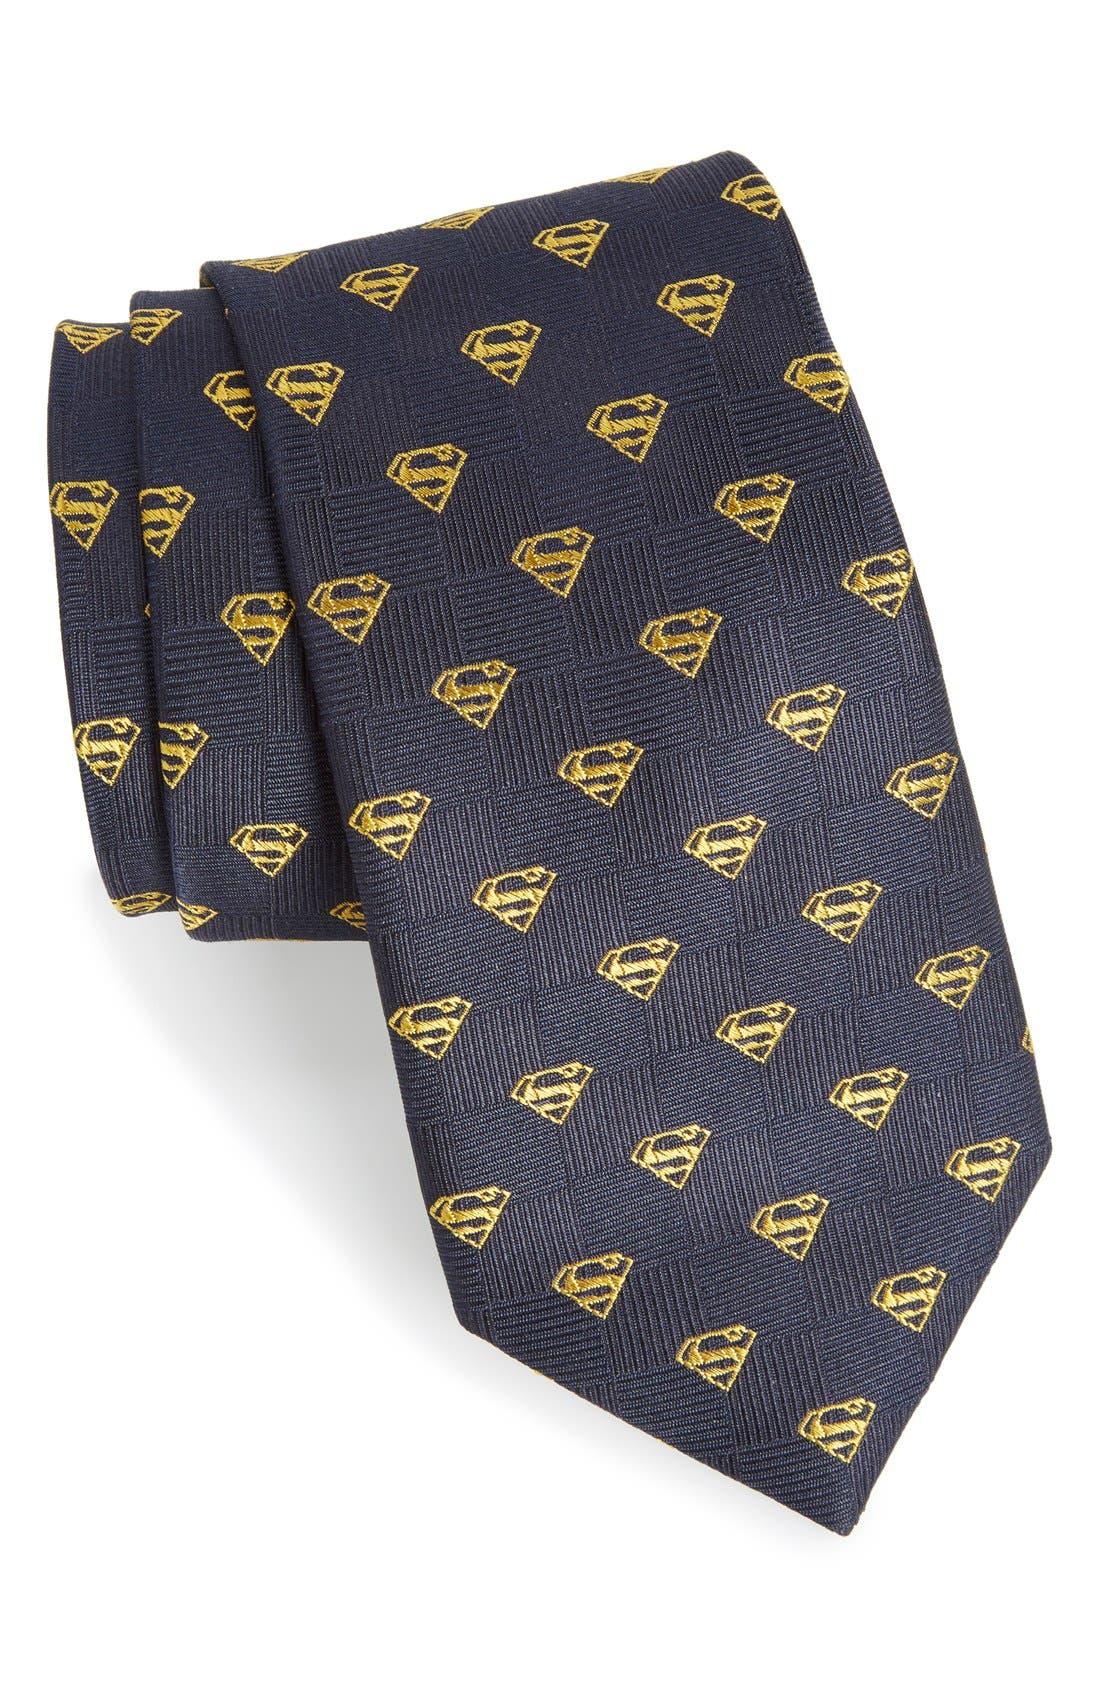 CUFFLINKS, INC. 'Superman Shield' Silk Tie, Main, color, 400